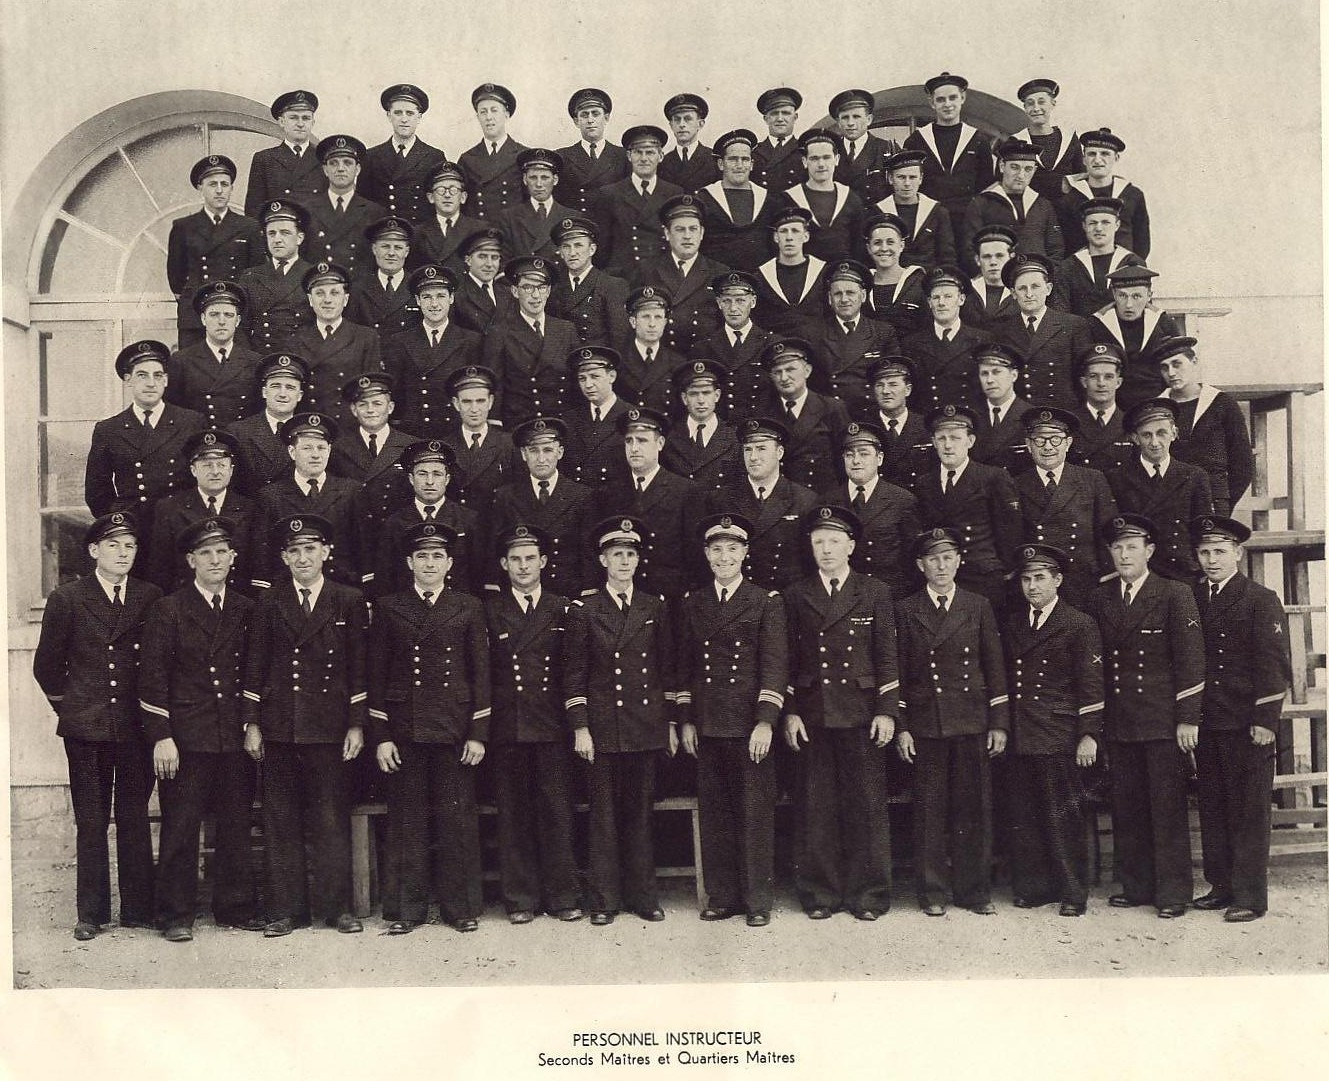 Instructeurs 1950